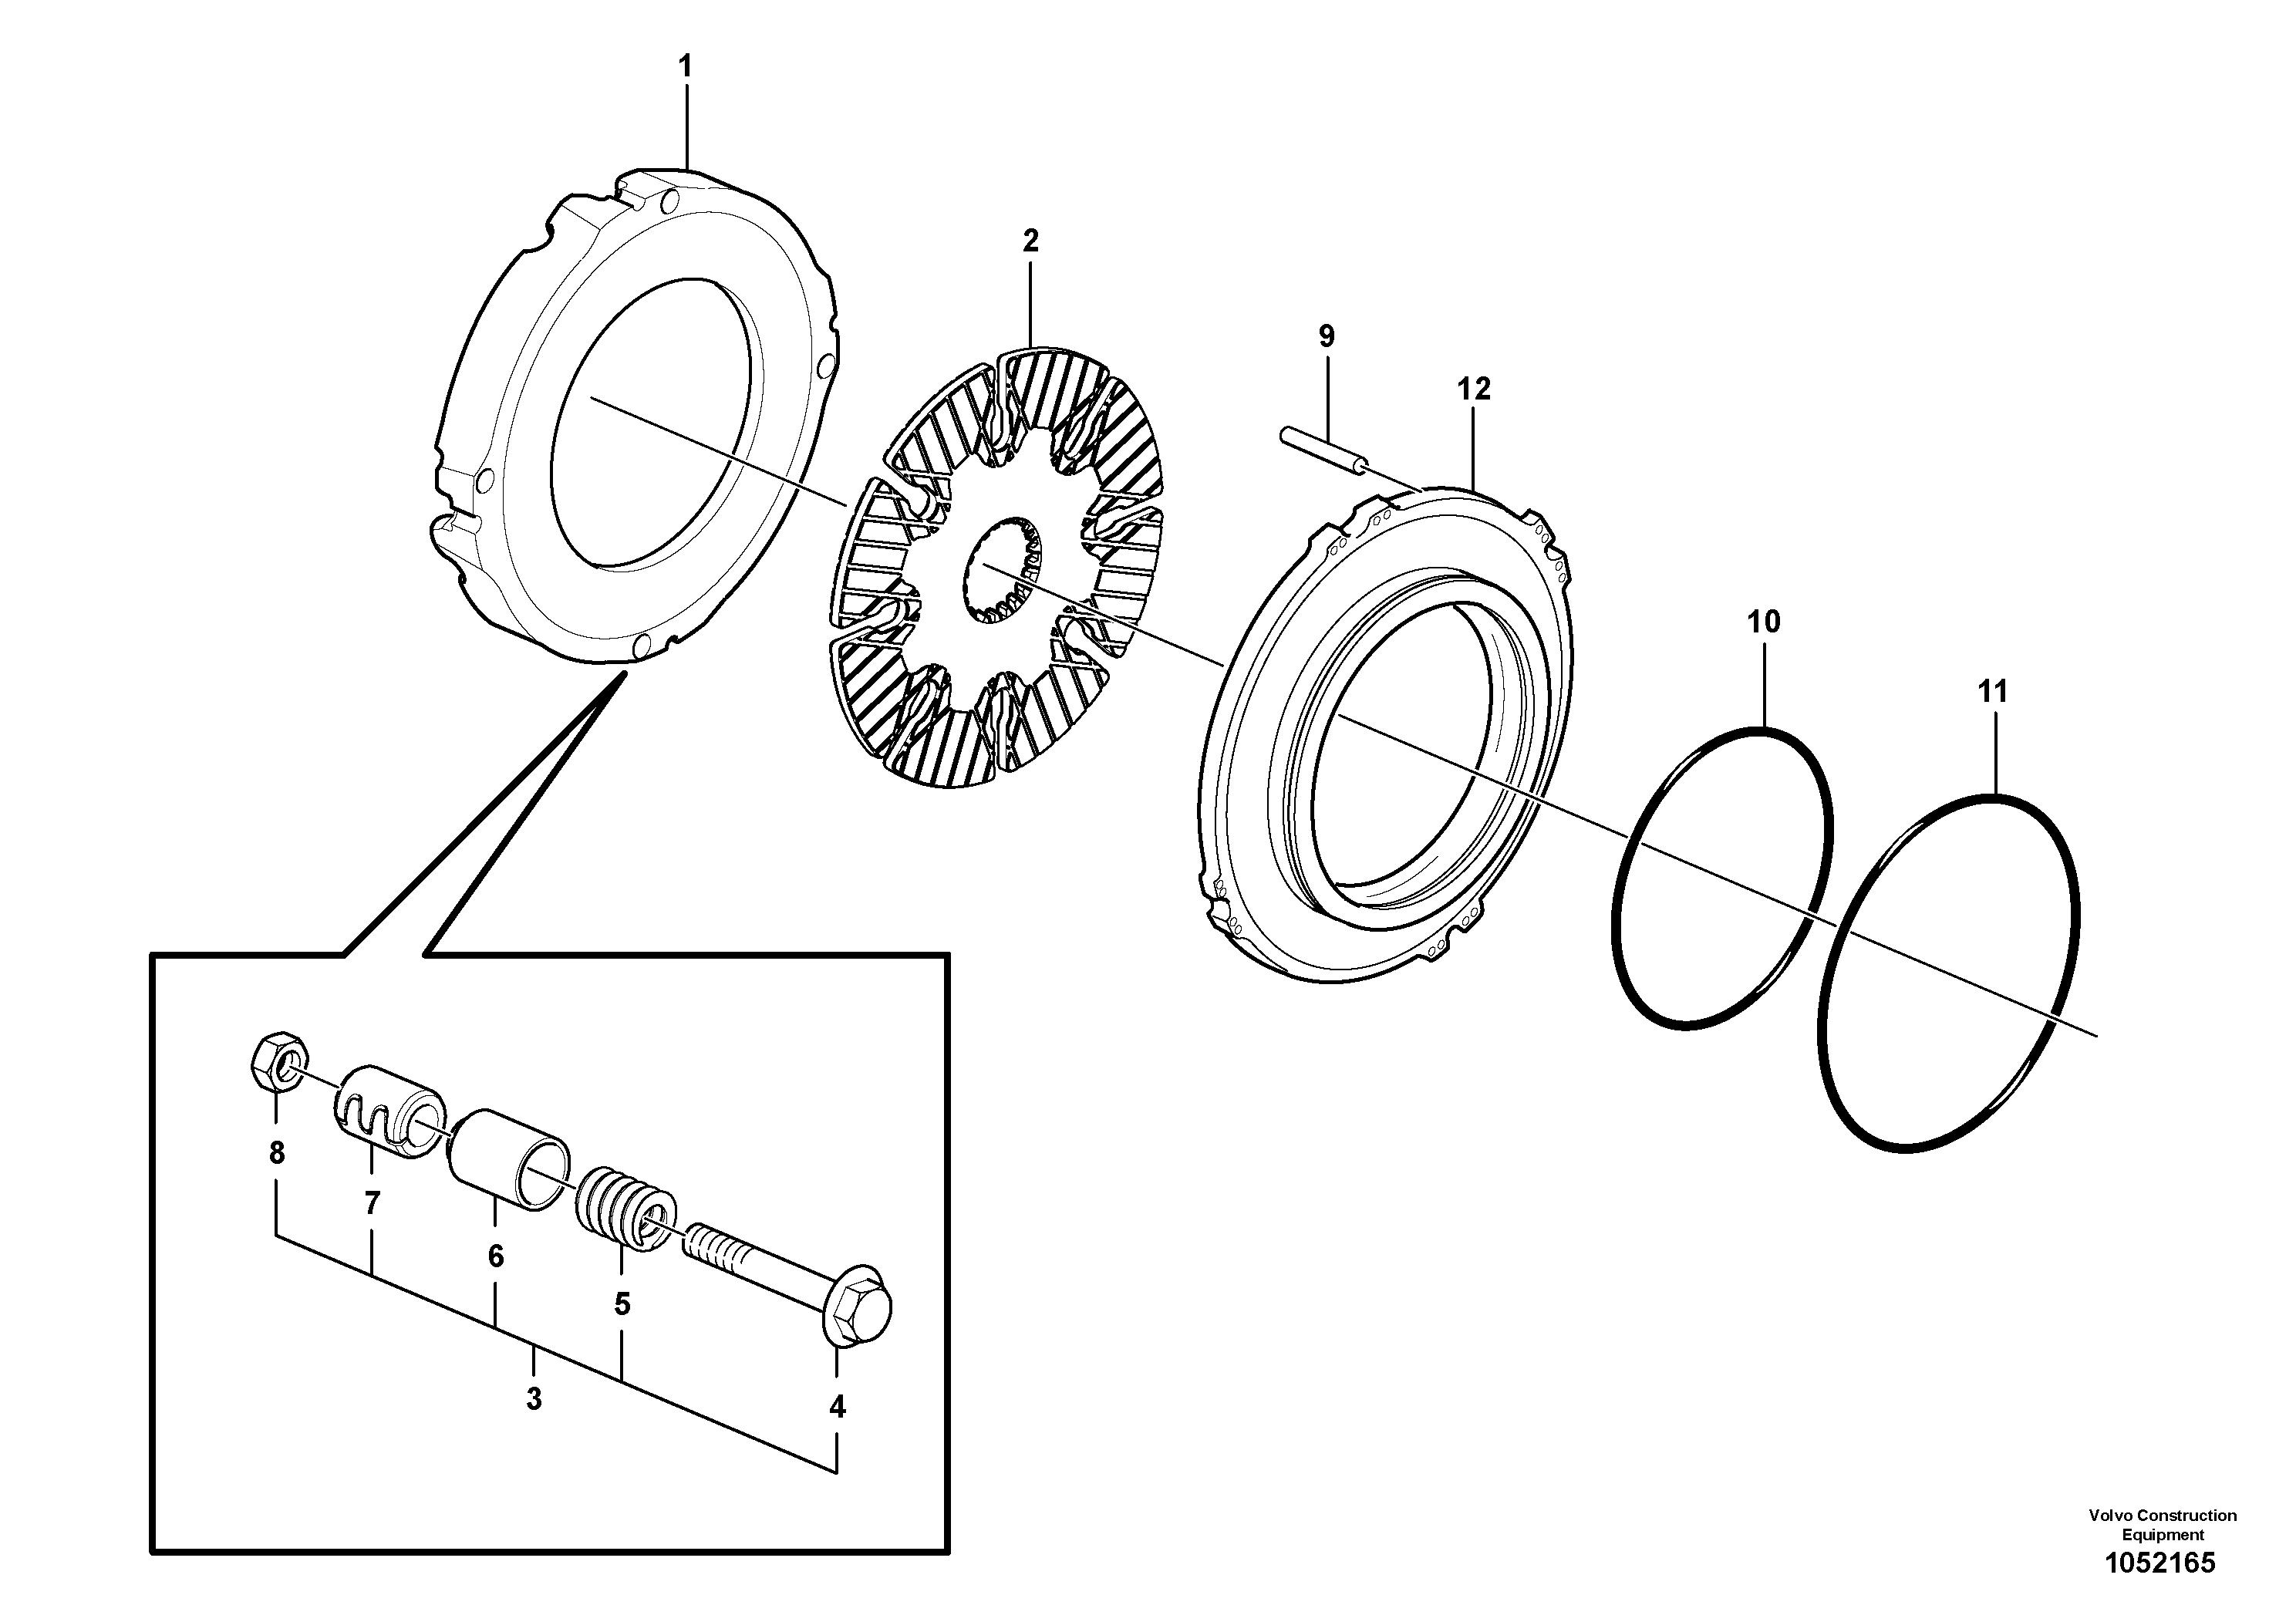 tekerlekli-yukleyici-amortisor